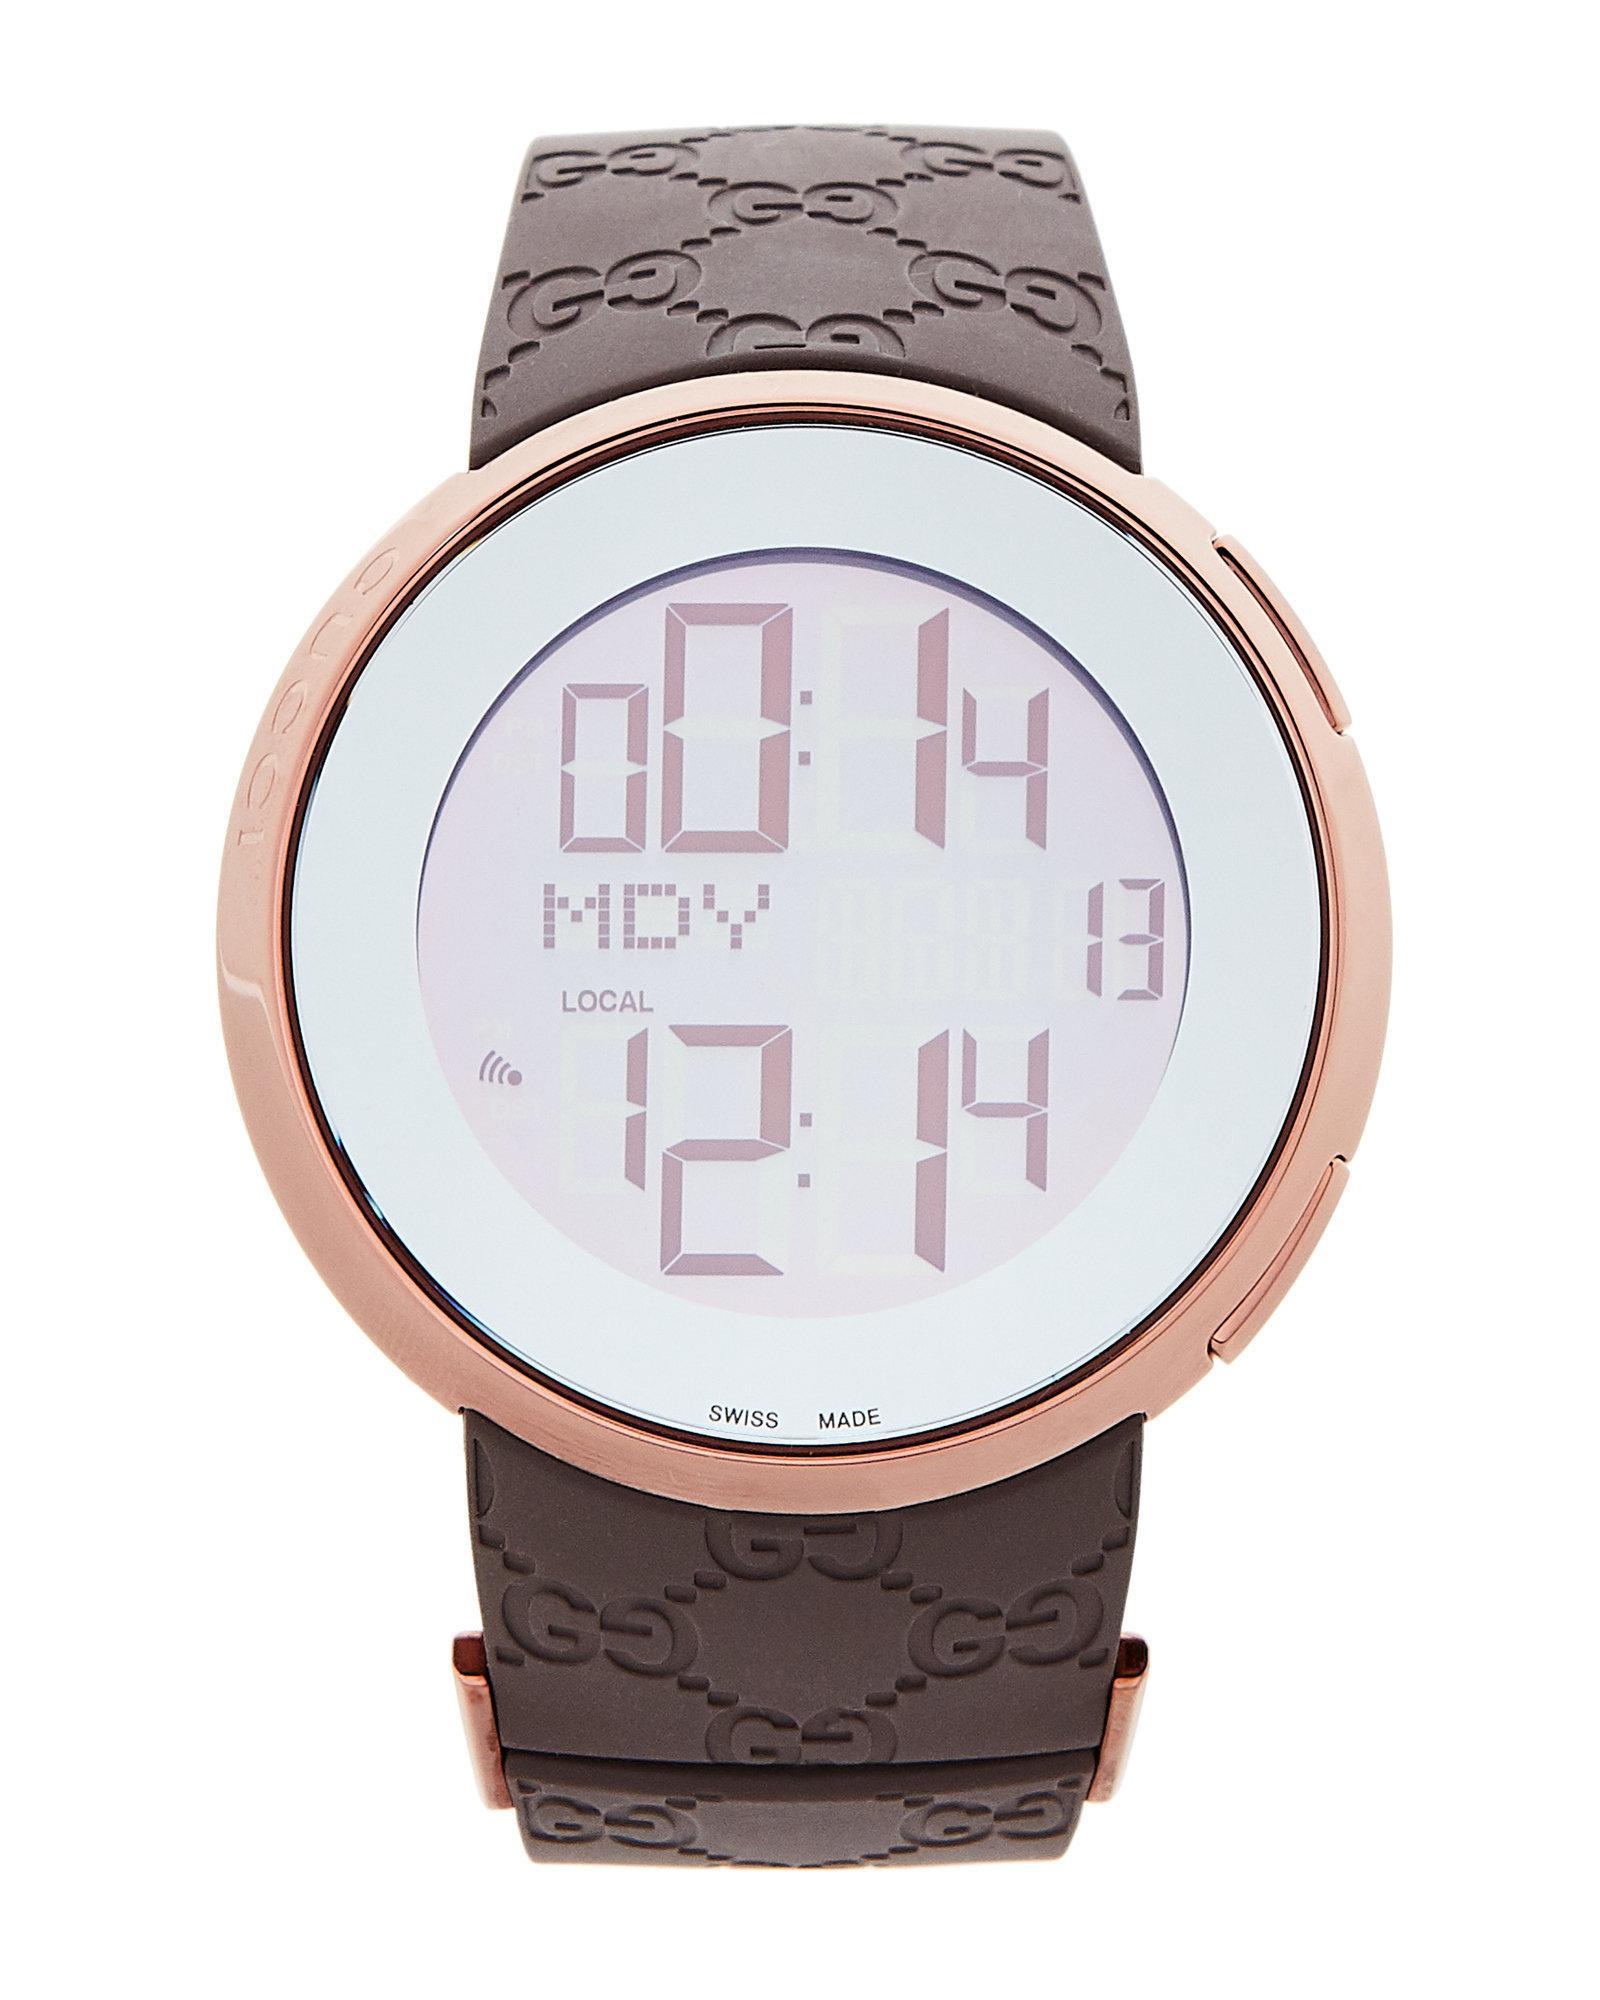 d7039b9c41b Lyst - Gucci Ya114209 114 I- Digital Watch in Metallic